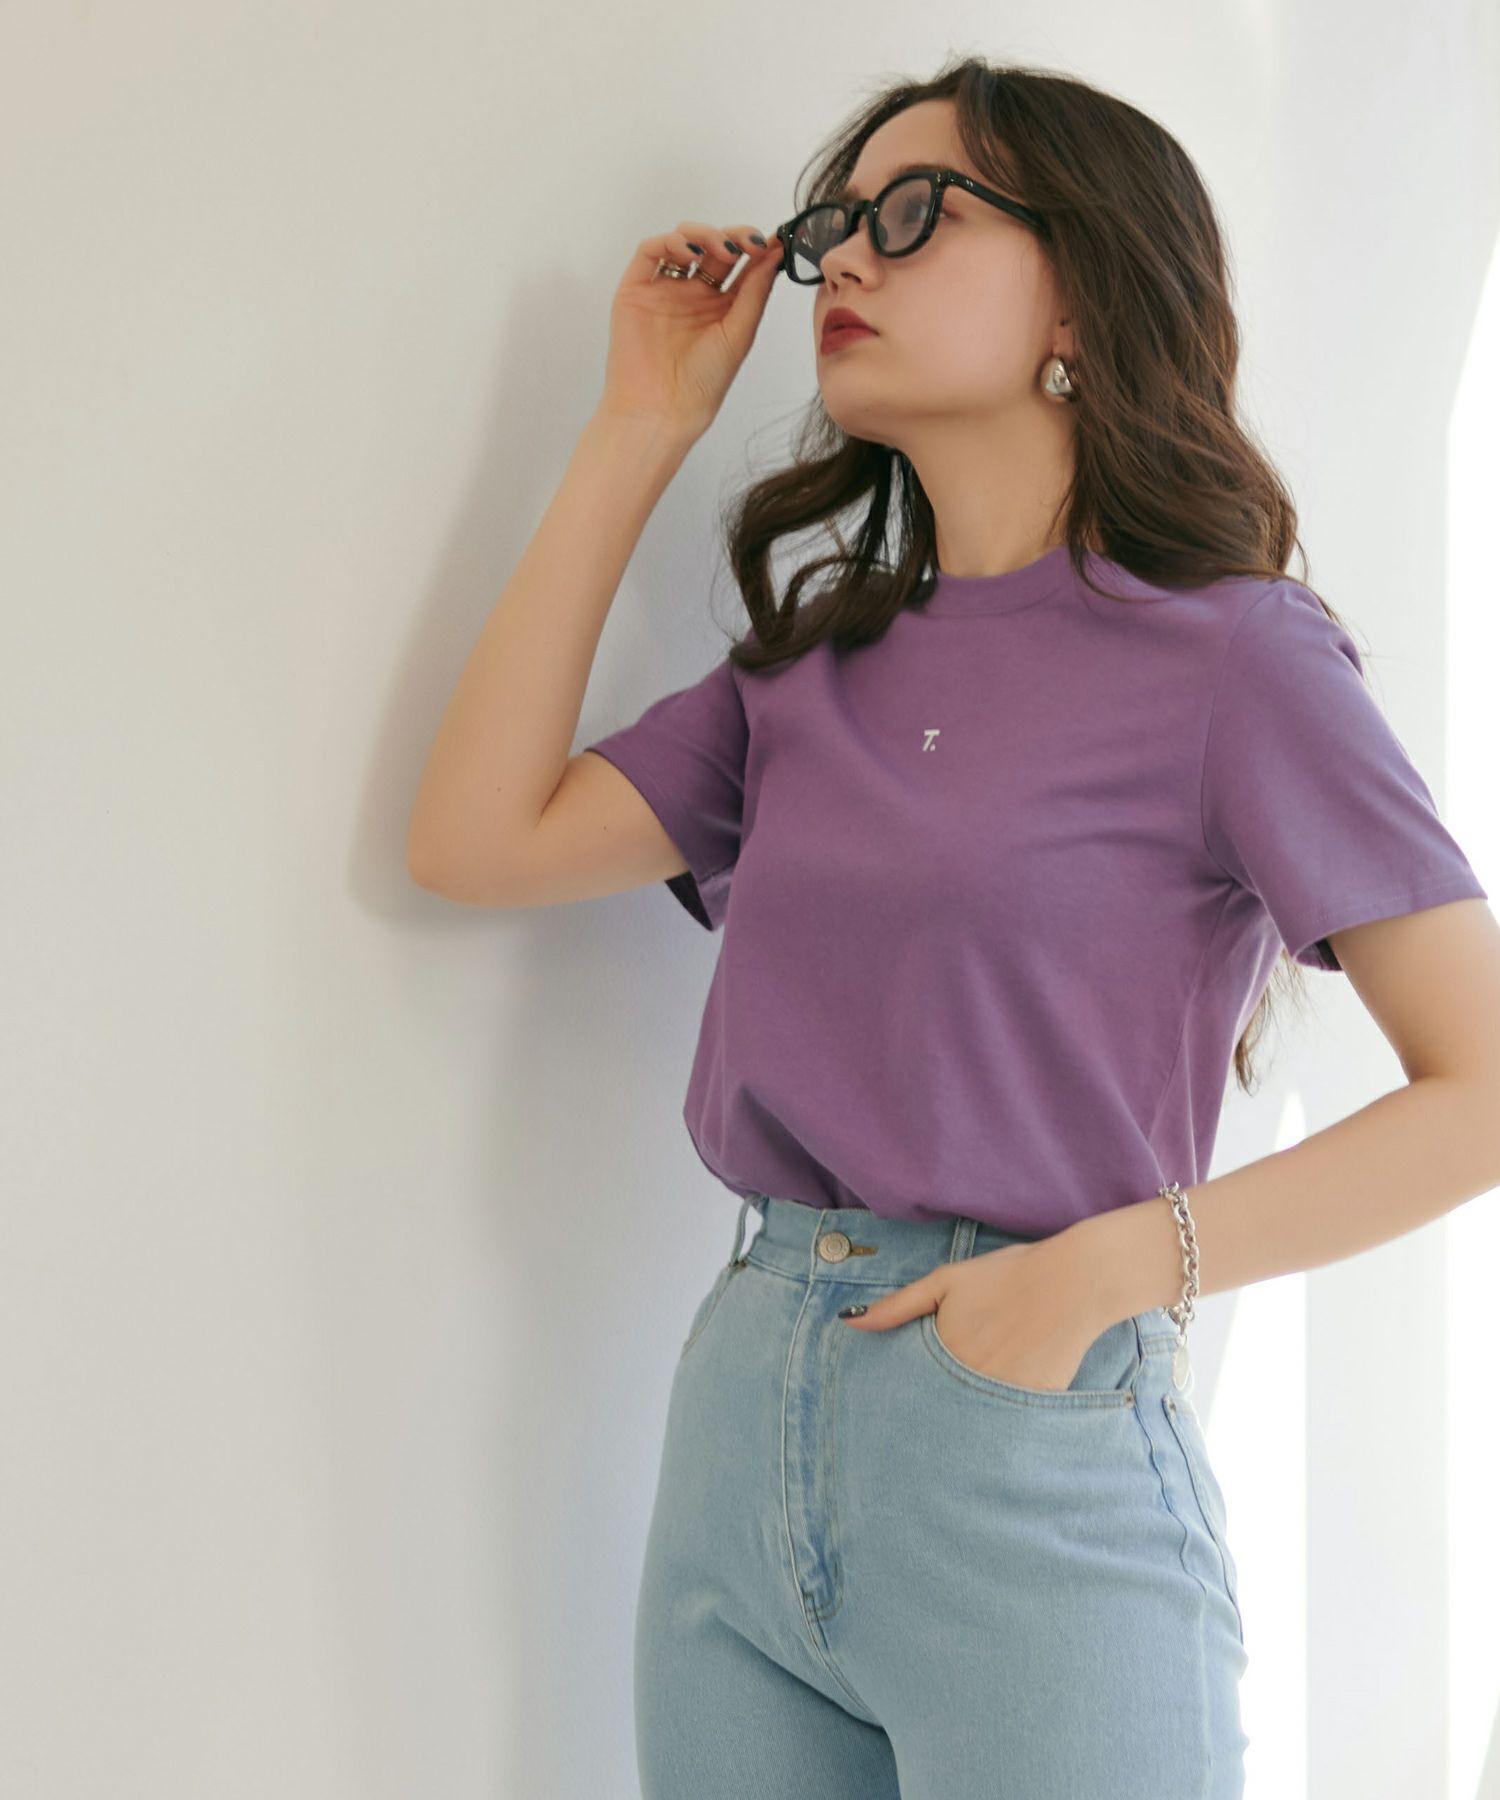 Tシャツ/刺繍入り/ホワイト/パープル/グレー/ブラック